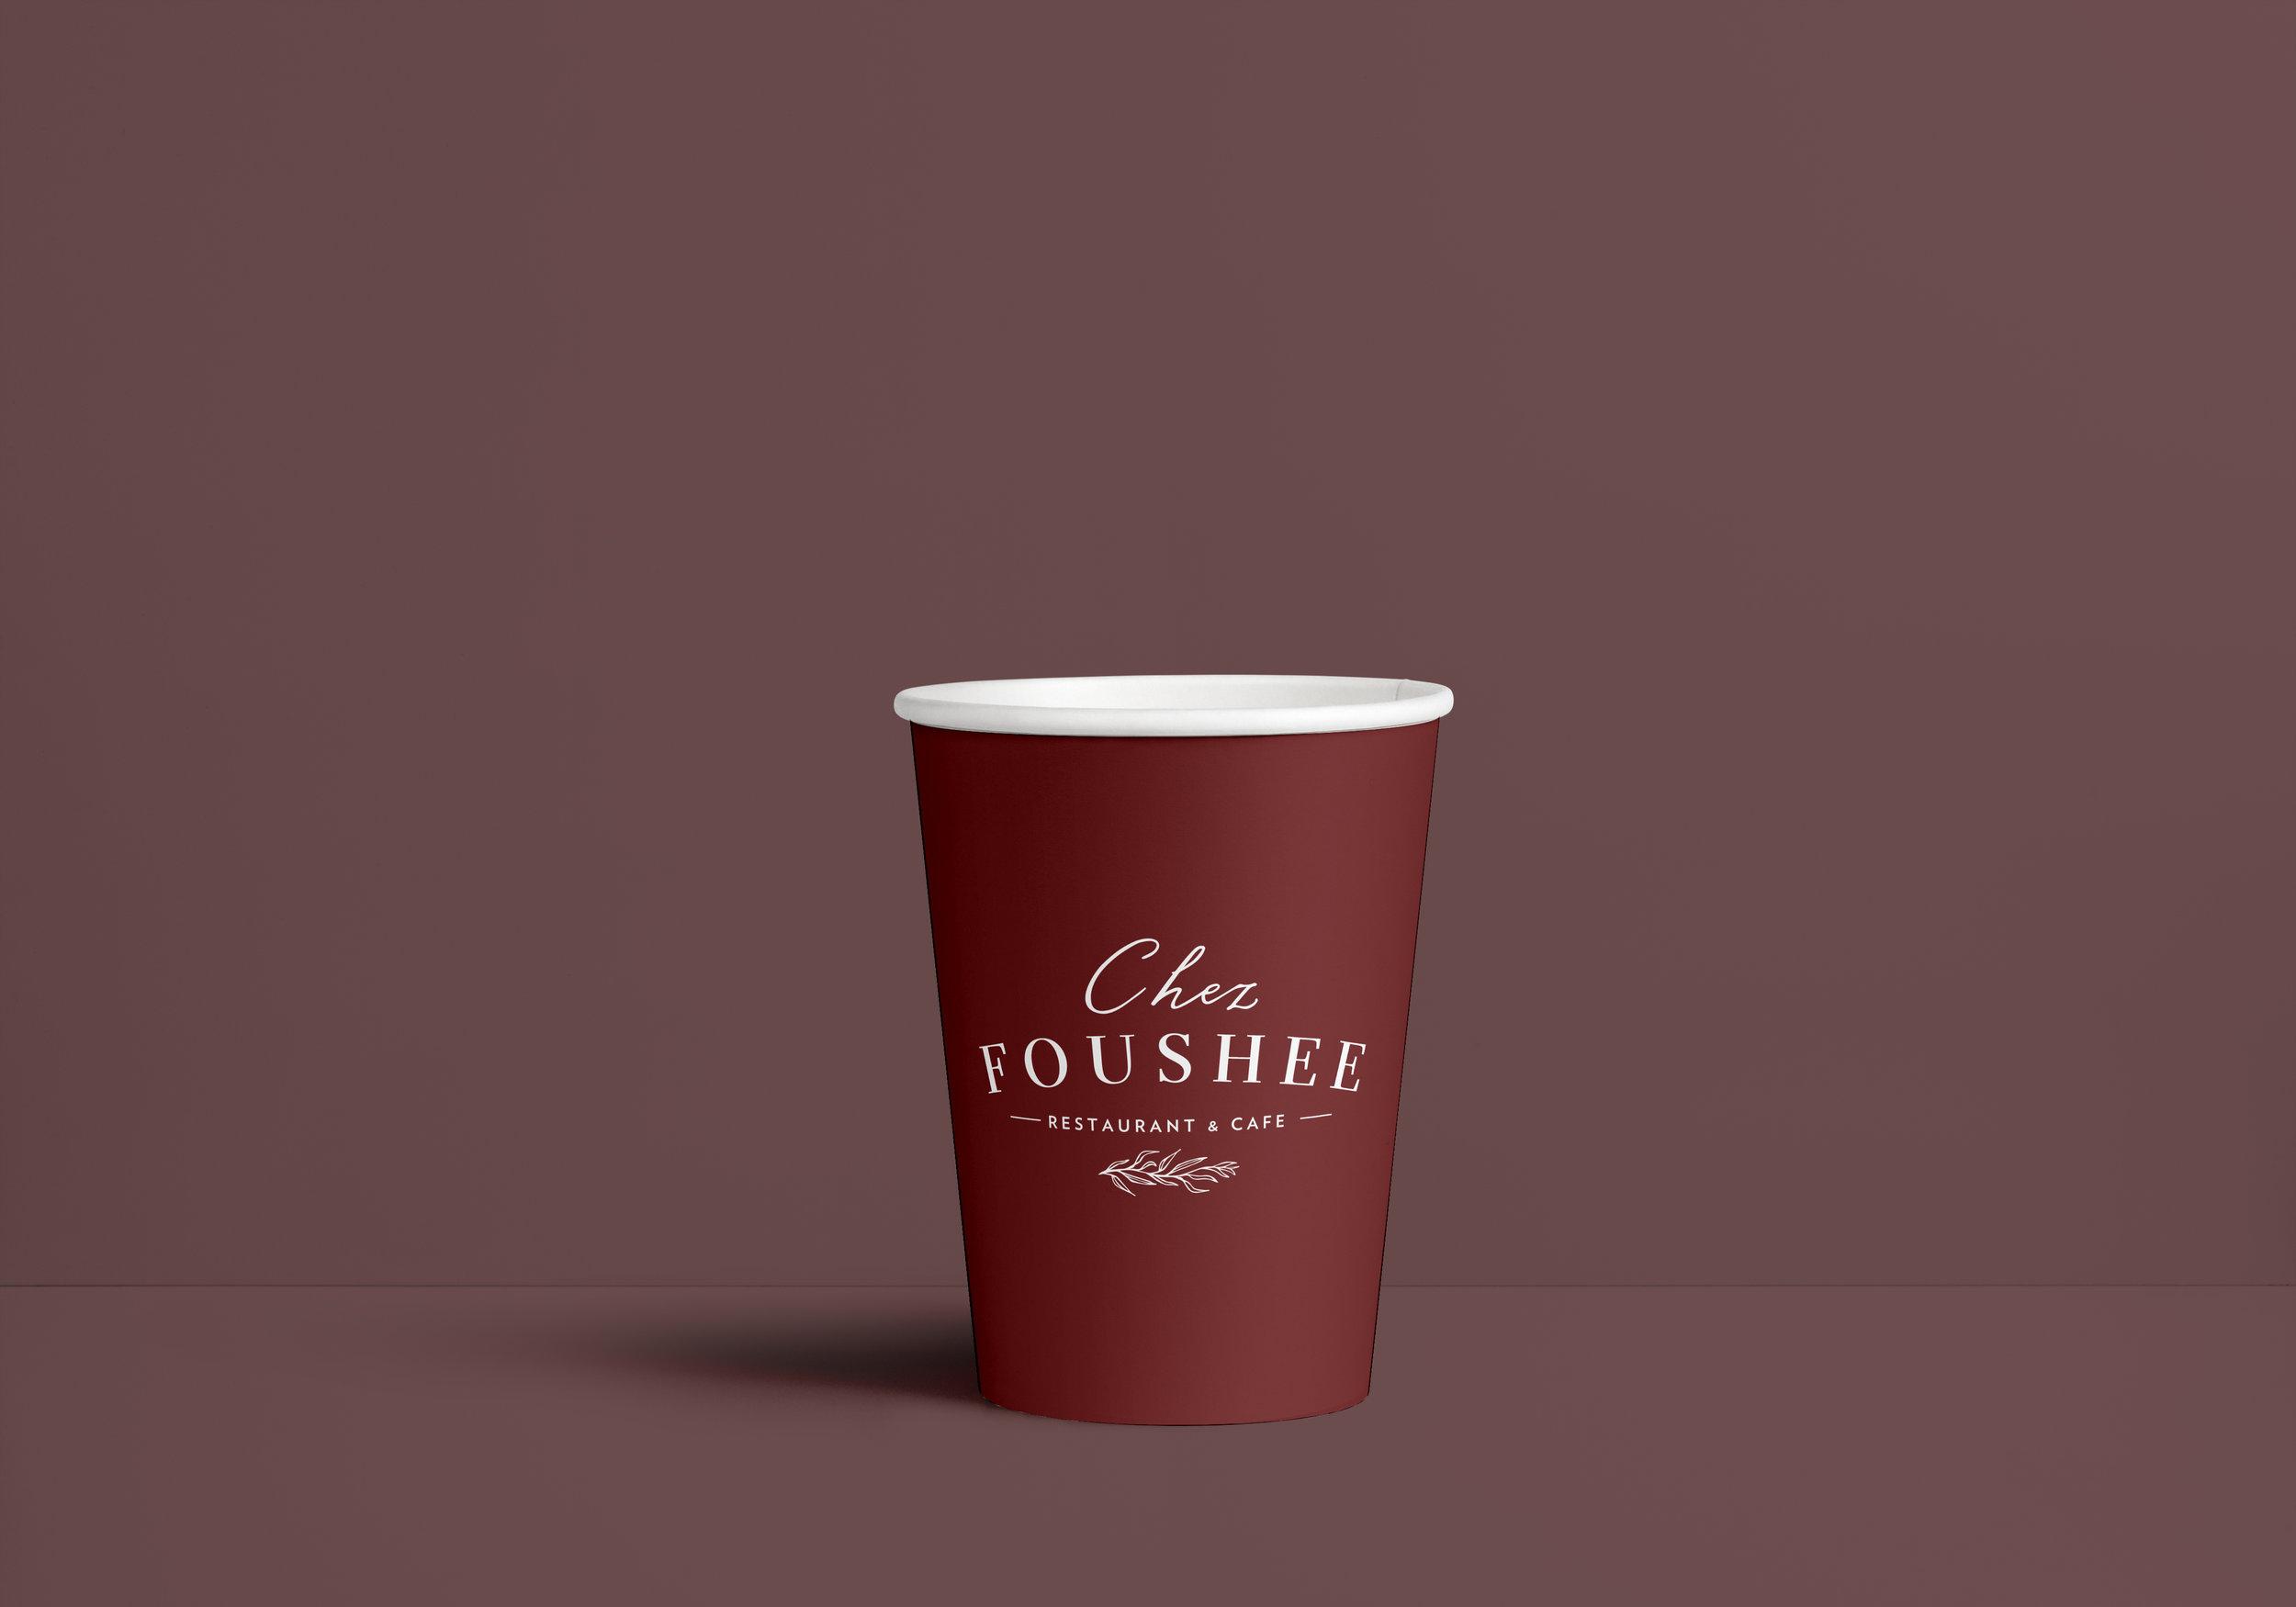 Chez+Foushee+cup.jpg